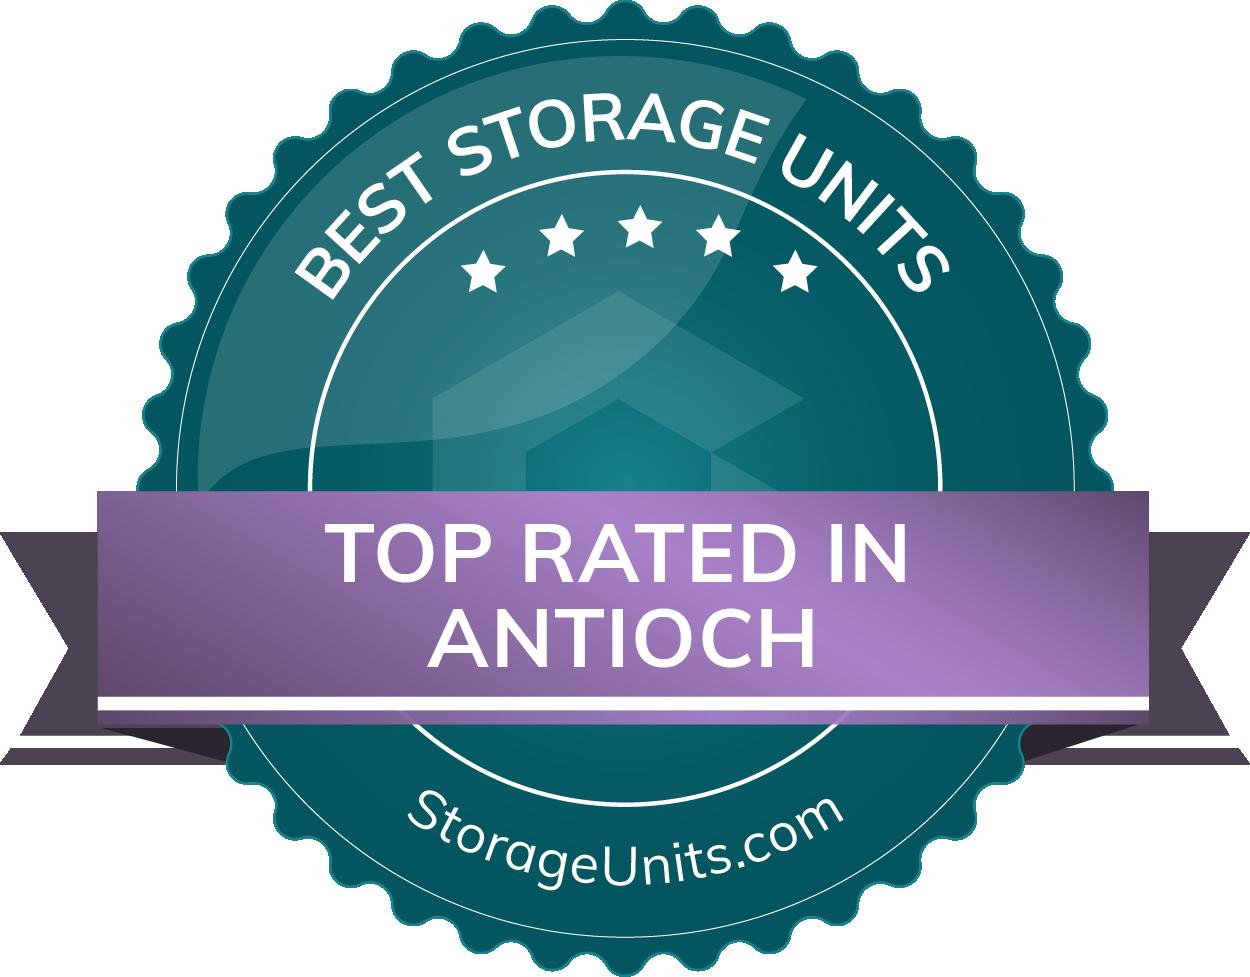 Best Self Storage Units in Antioch, CA